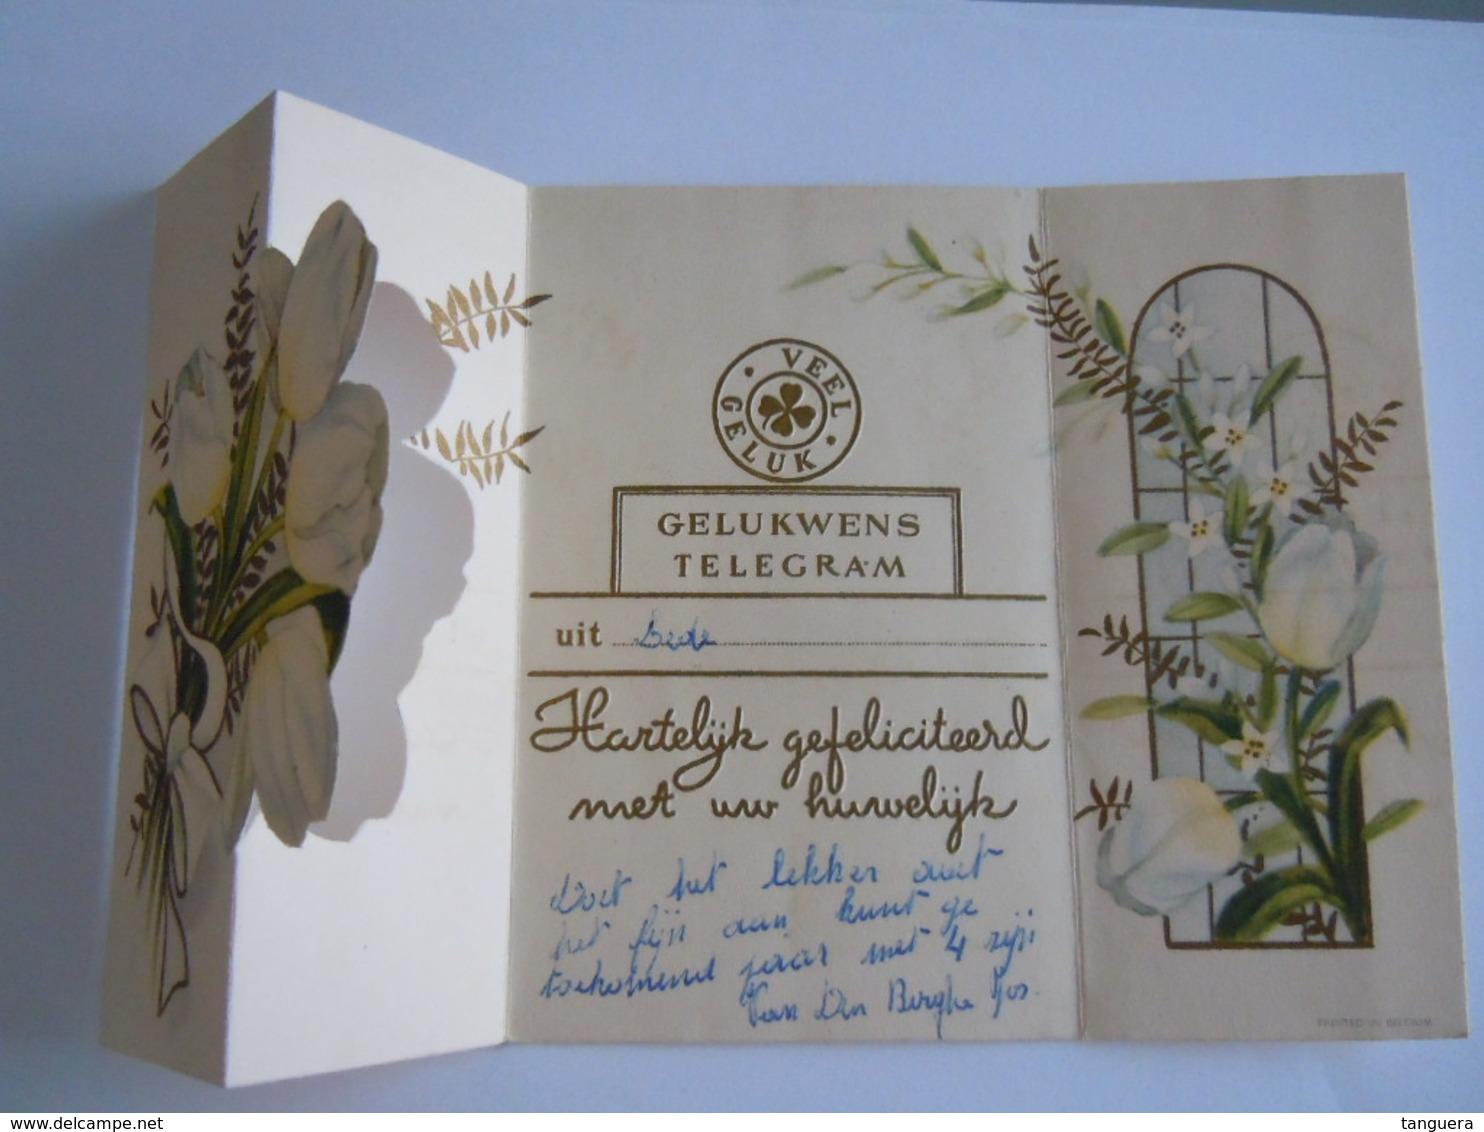 Huwelijk Mariage Gelukwensch Telegram Télégramme De Bonheur Tulpen Tulipes Lede Belgium - Holidays & Celebrations